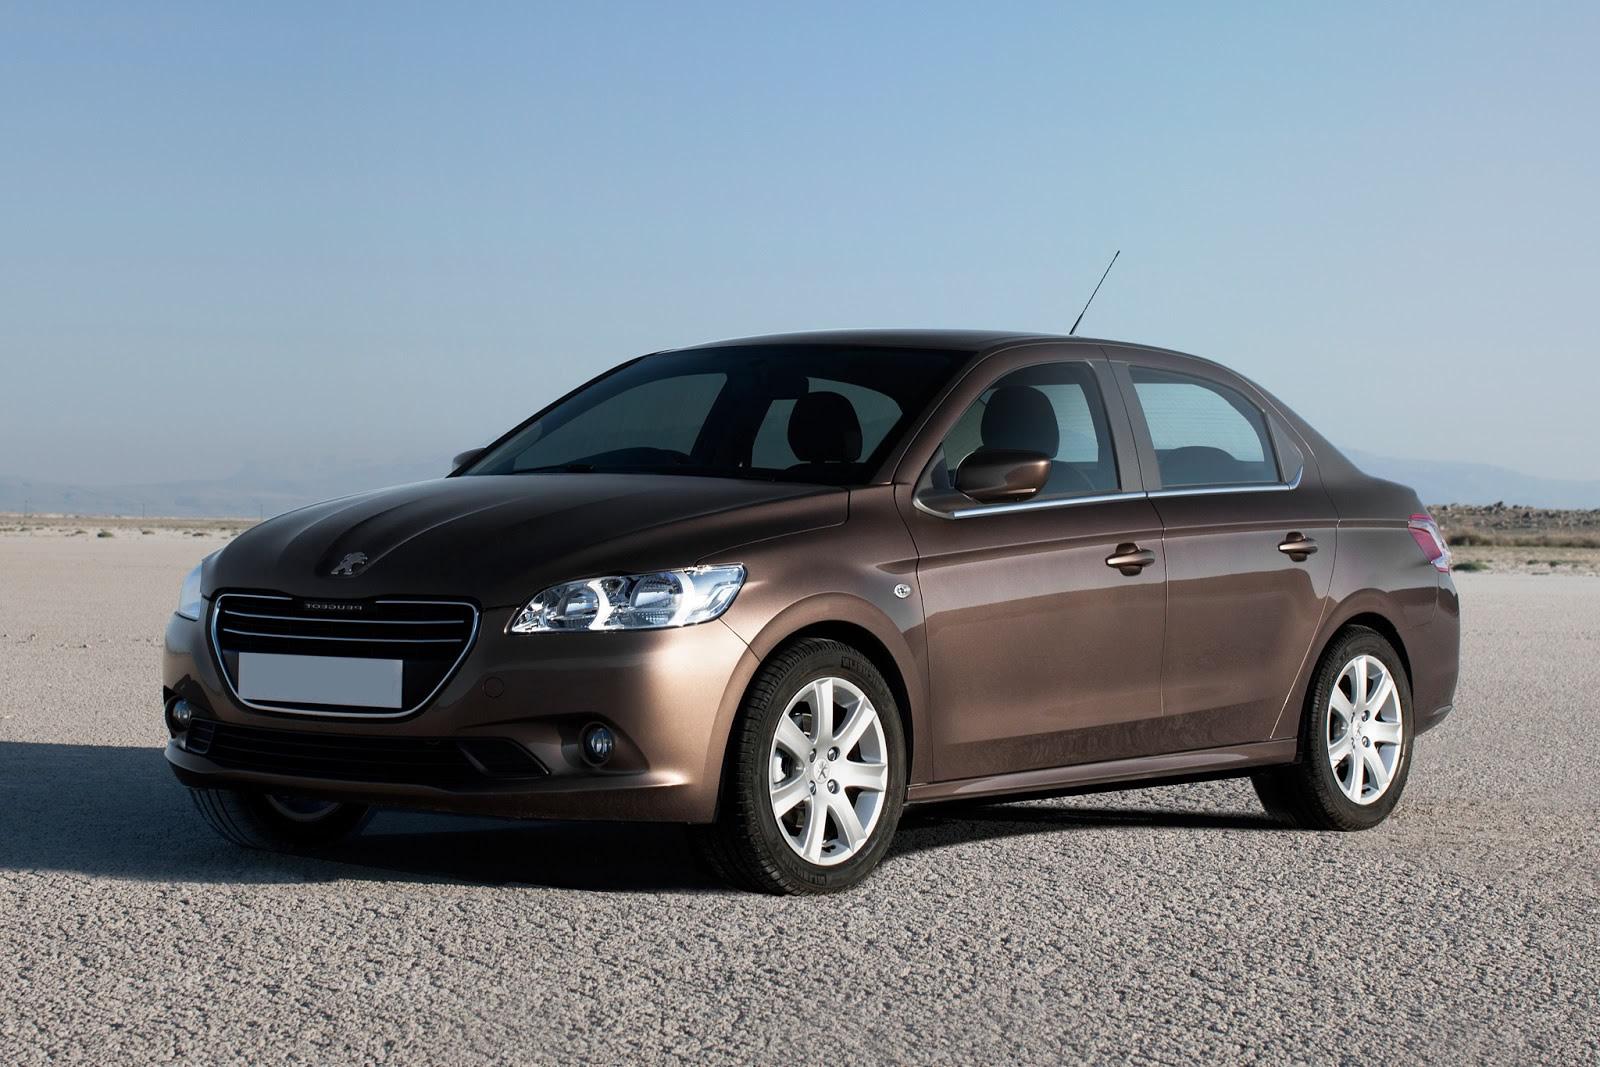 Car Gps Online Price Mini Car Gps Signal Jammer Block All